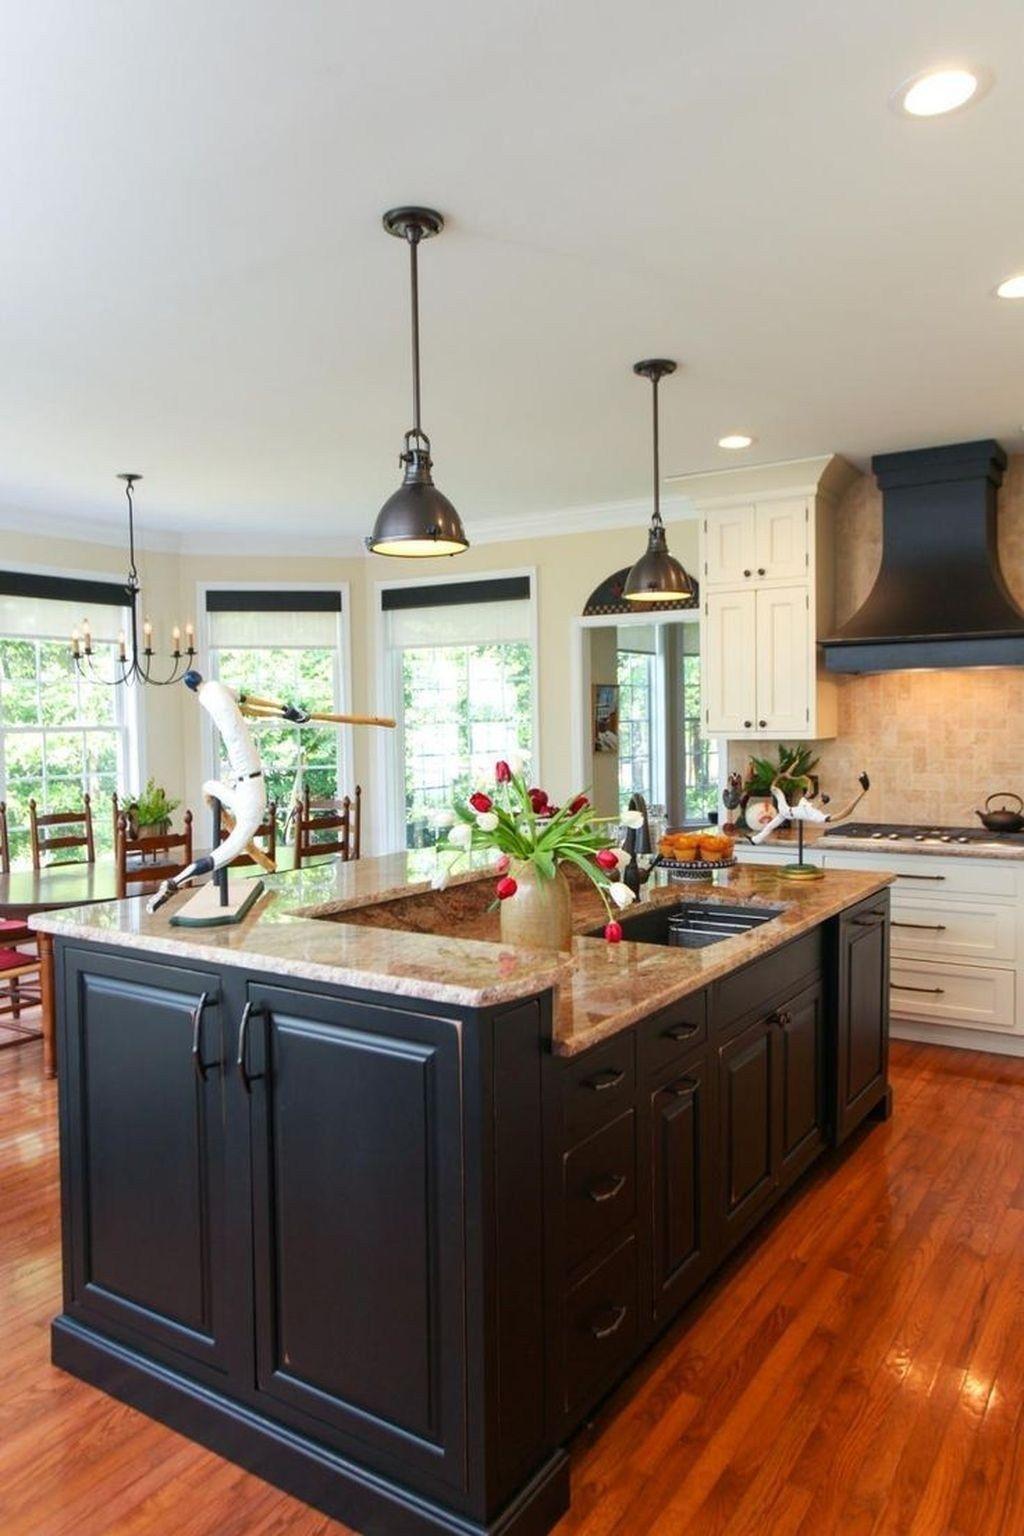 84 Custom Luxury Kitchen Island Ideas Designs Pictures Luxury Kitchen Island Kitchen Island Design Kitchen Island With Stove